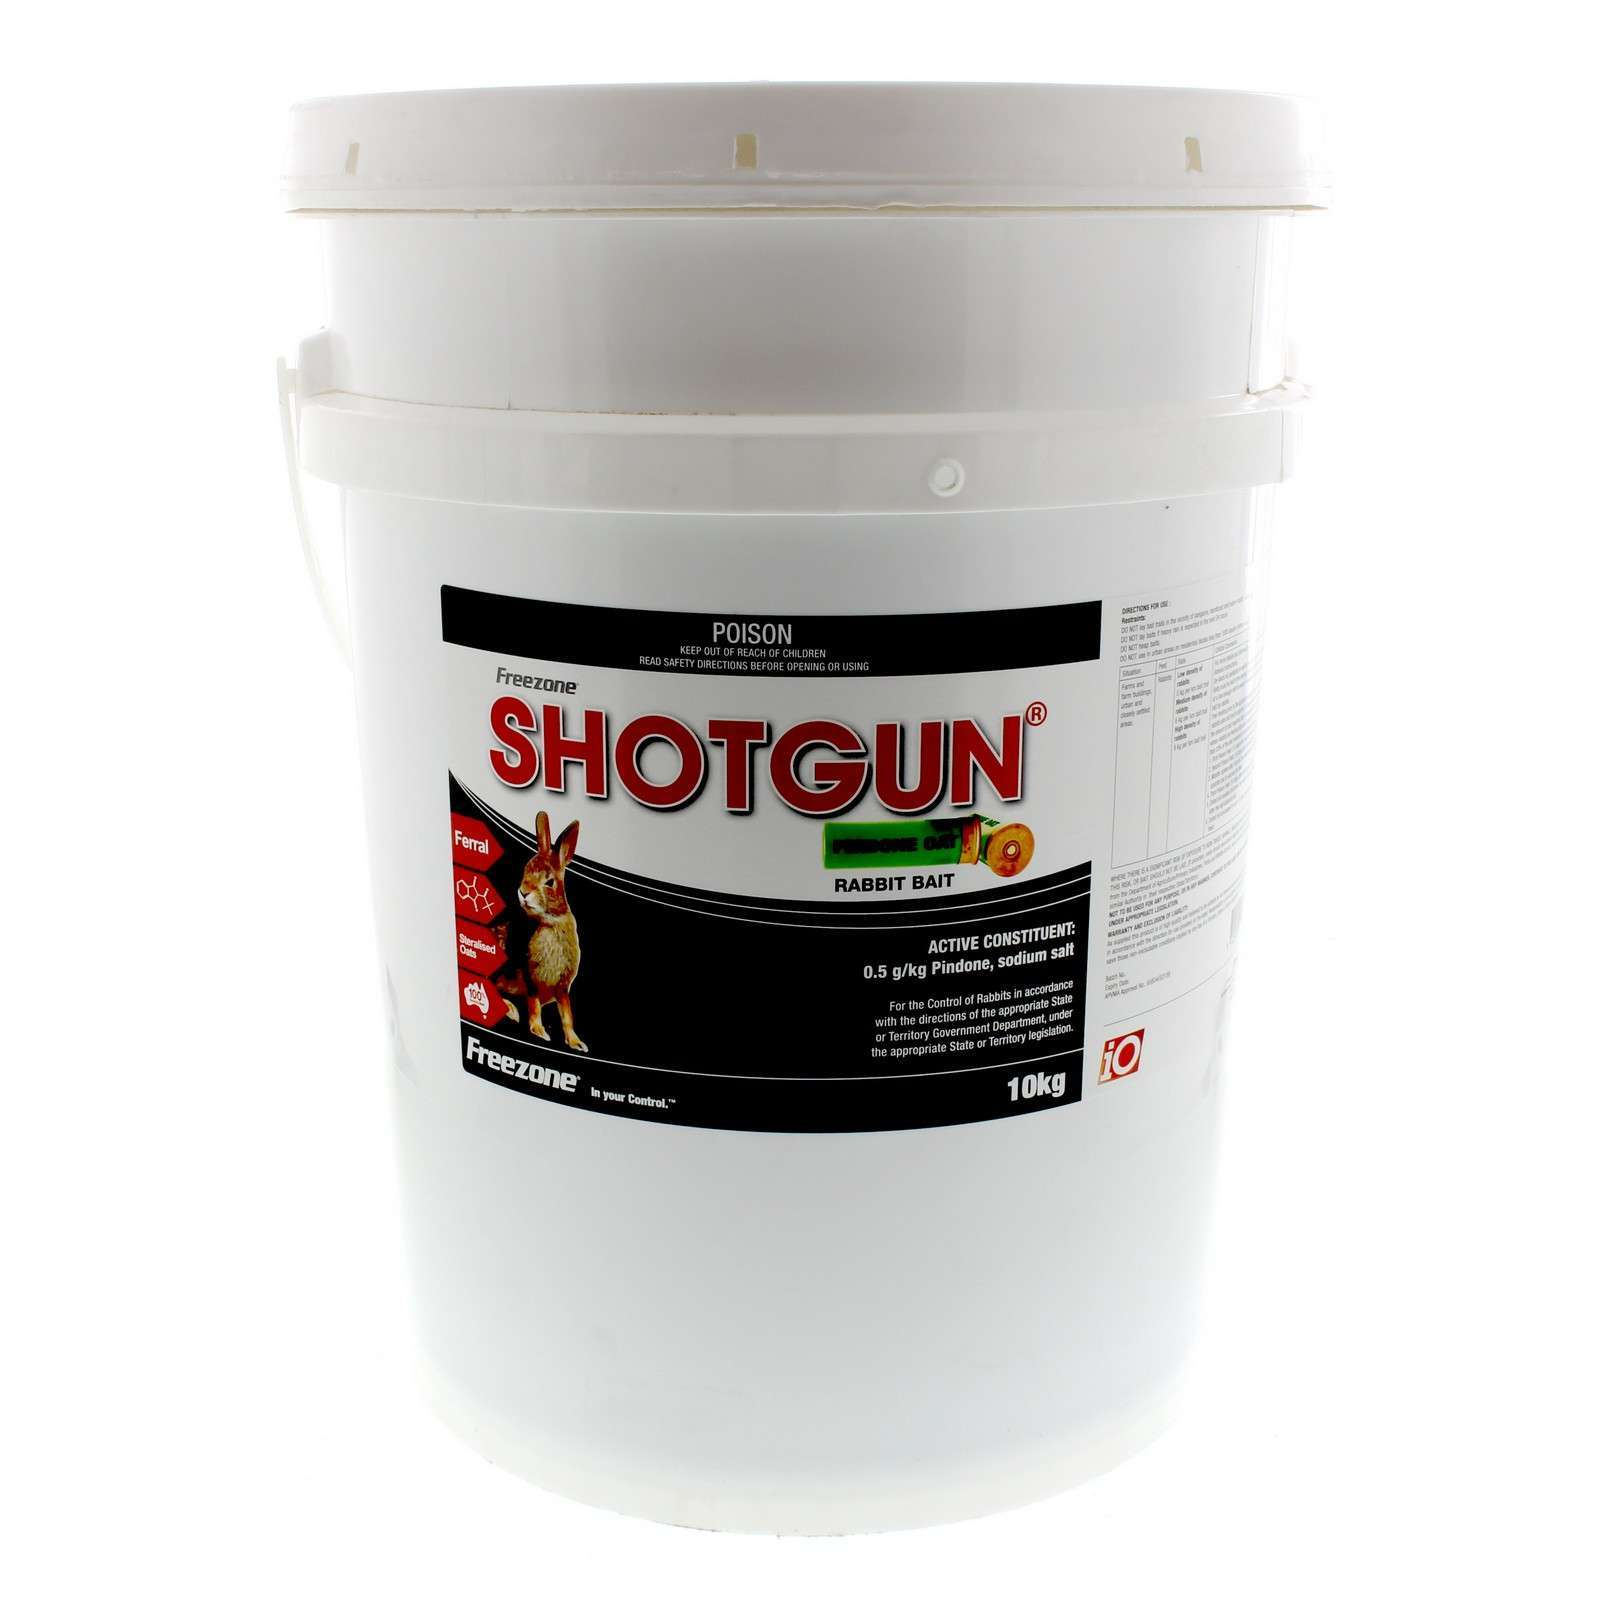 Shotgun Pindone Oat Rabbit Bait Oatbait Freezone 10kg Anticoagulant Oat Poison